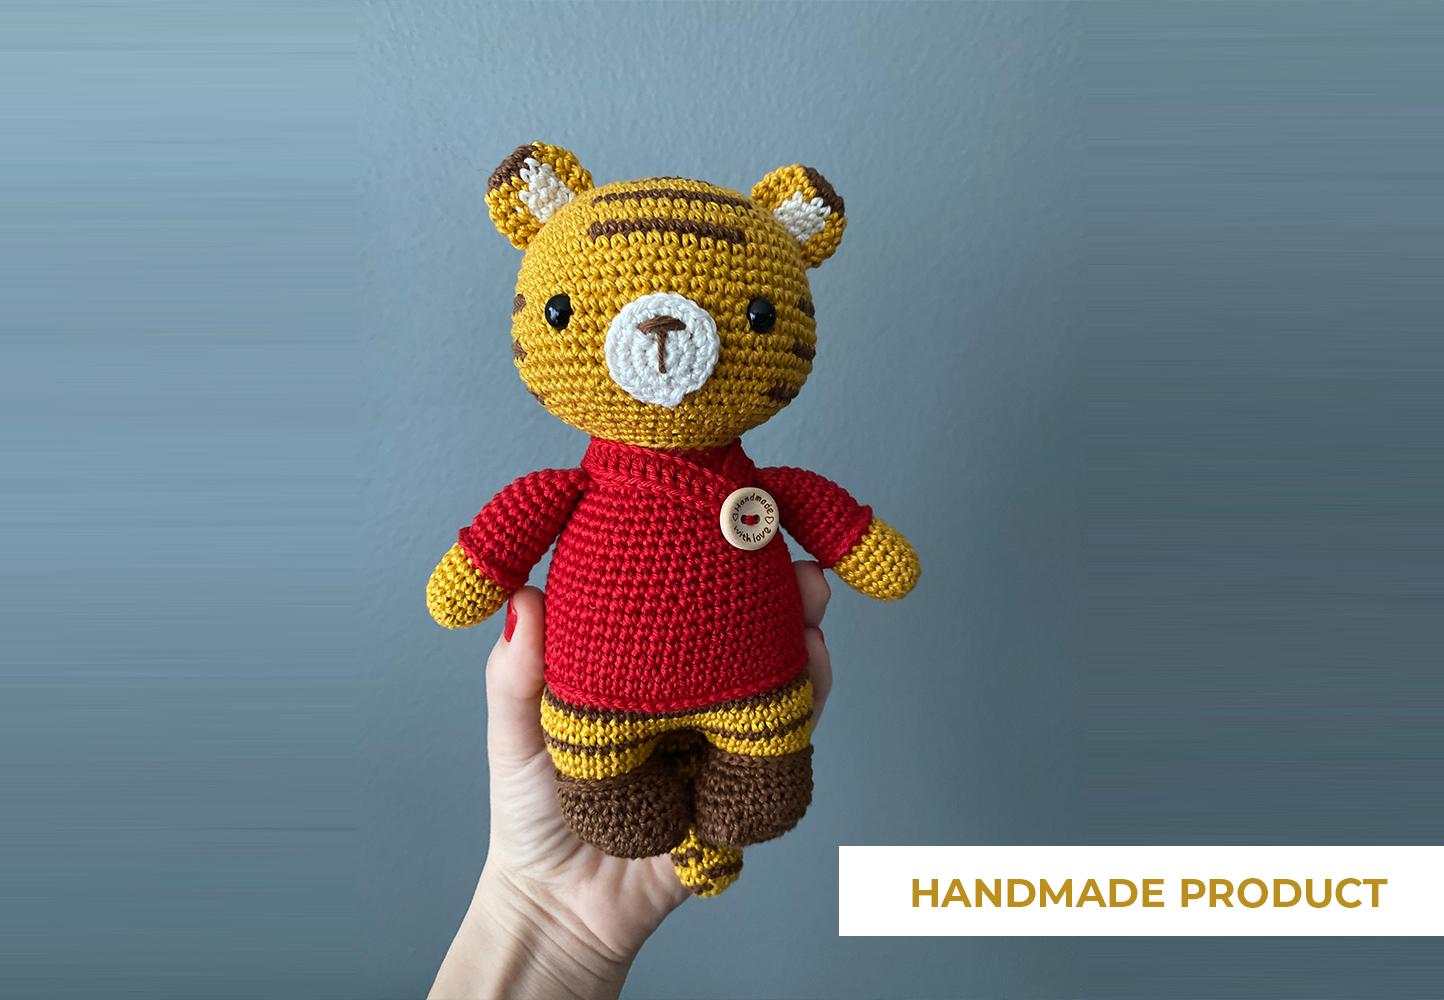 Handmade Product